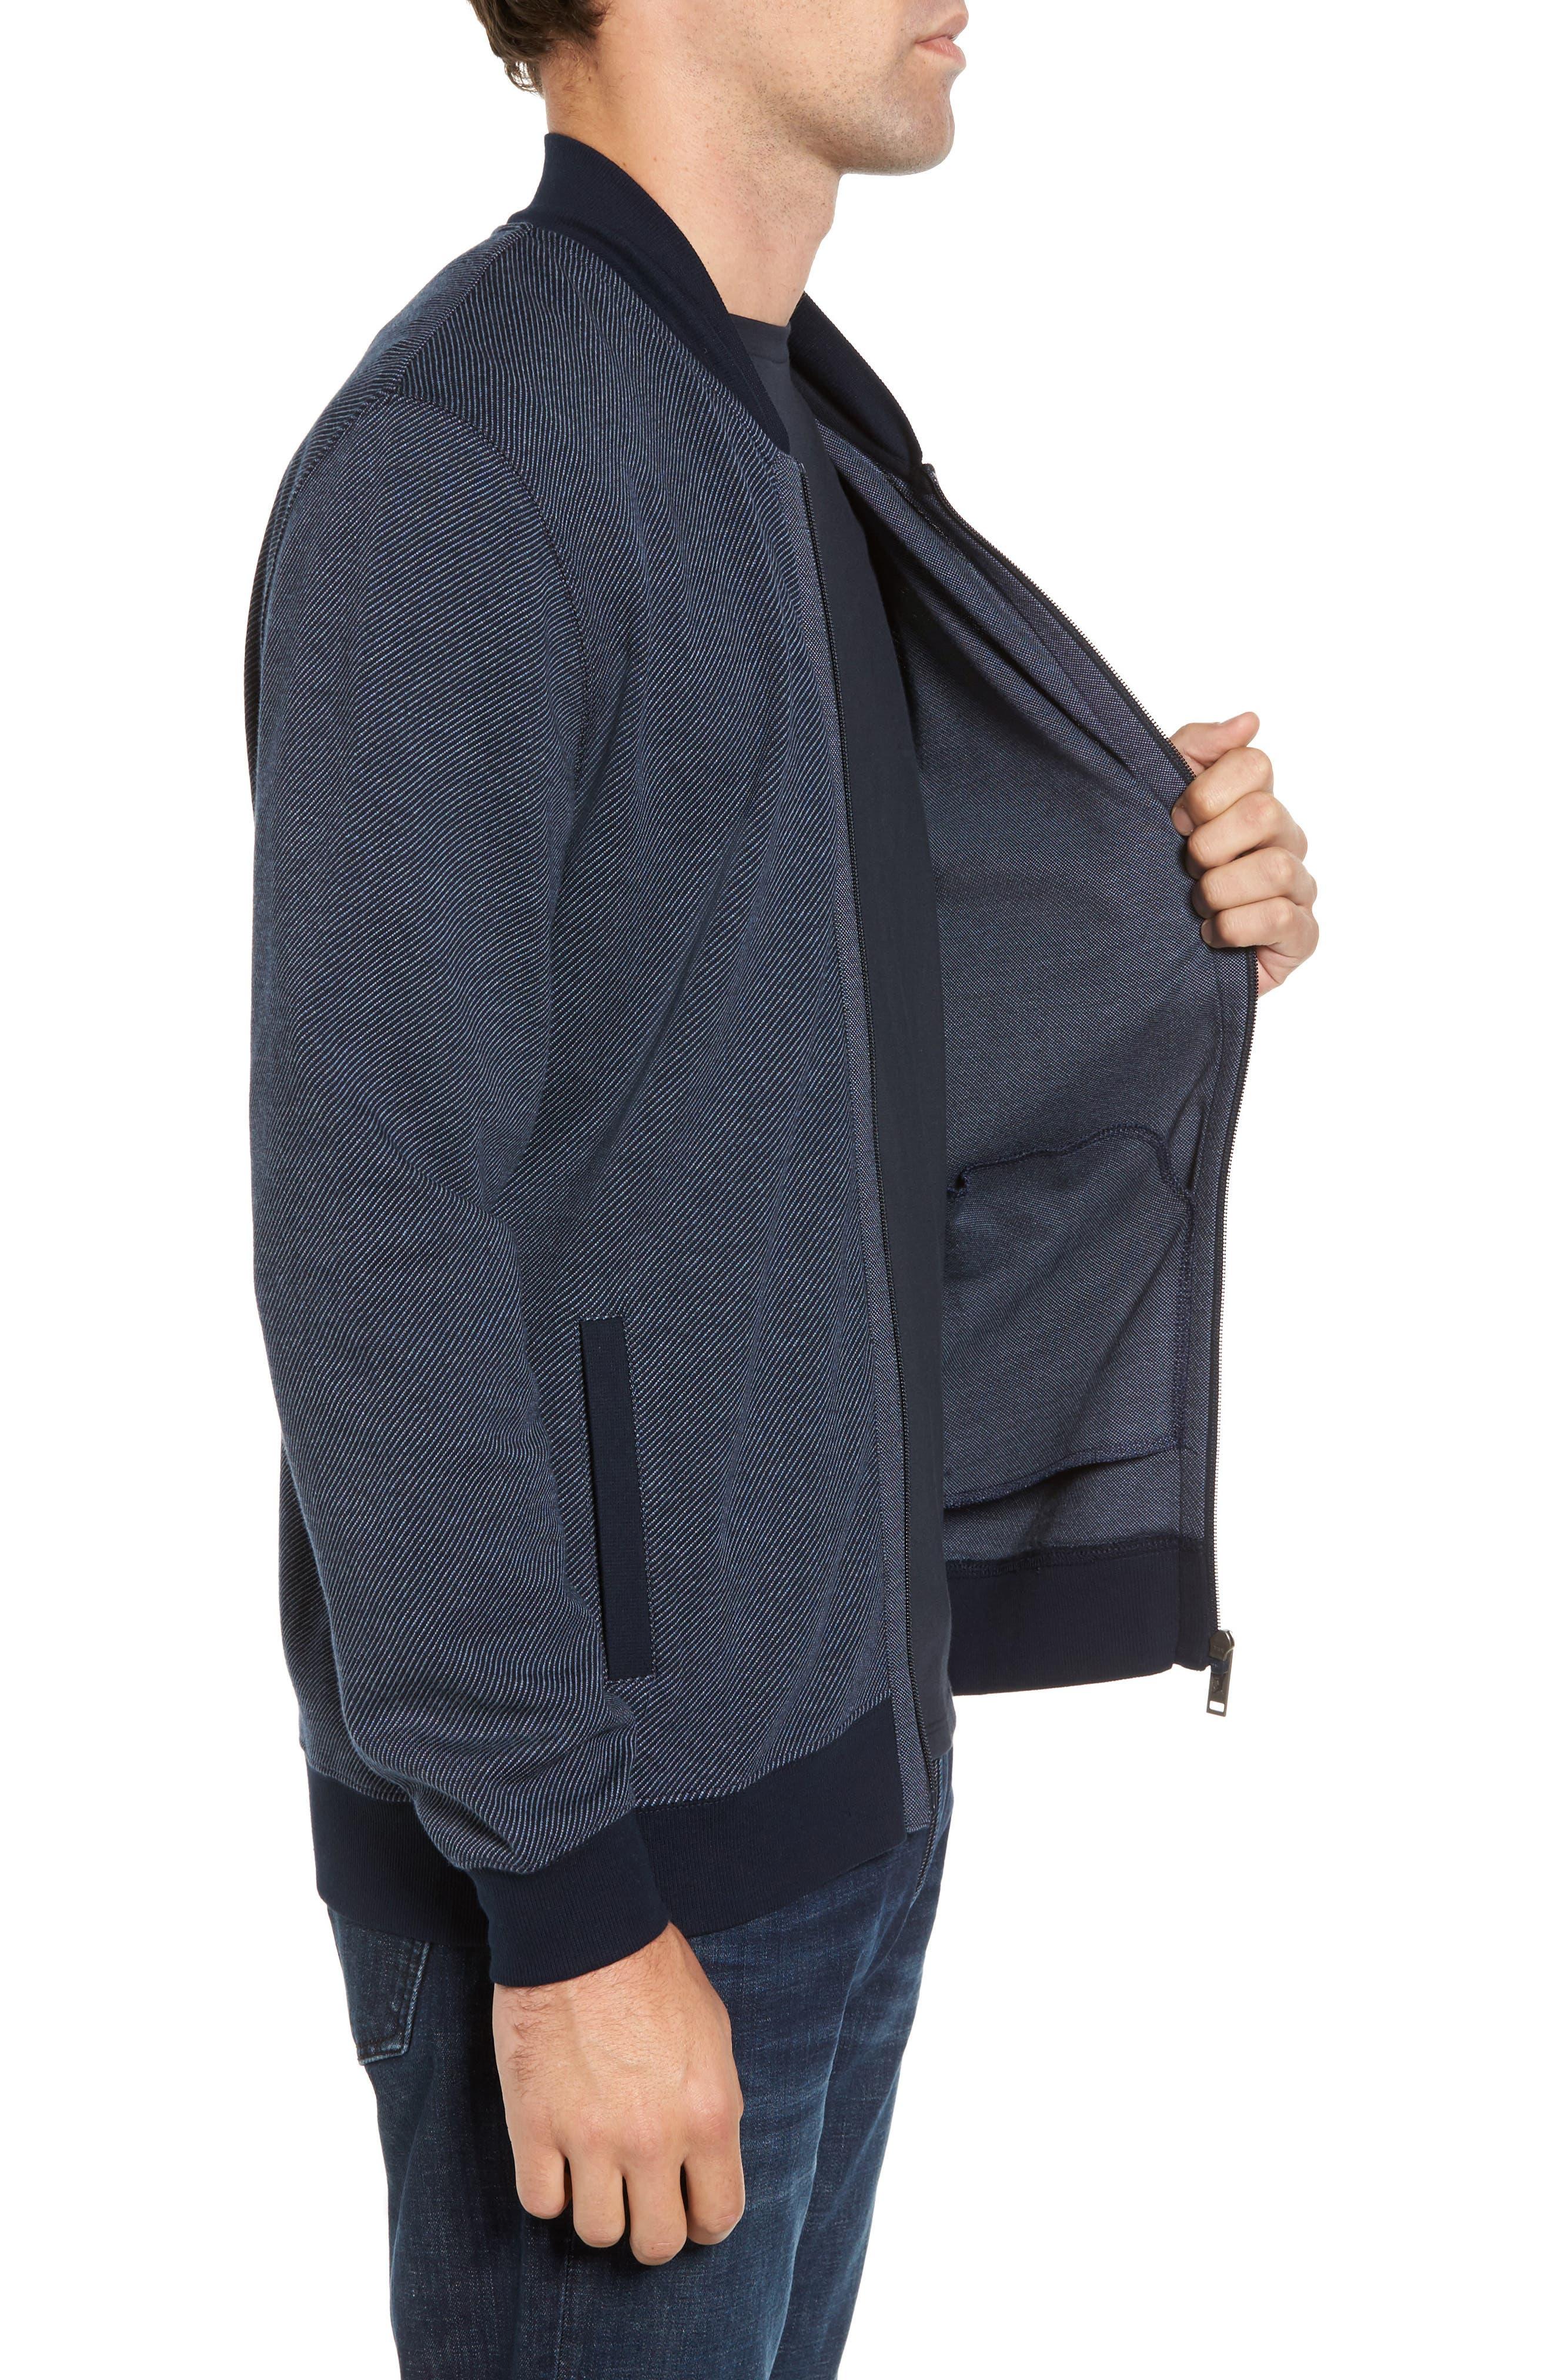 Alderson Ave Fleece Jacket,                             Alternate thumbnail 3, color,                             Navy